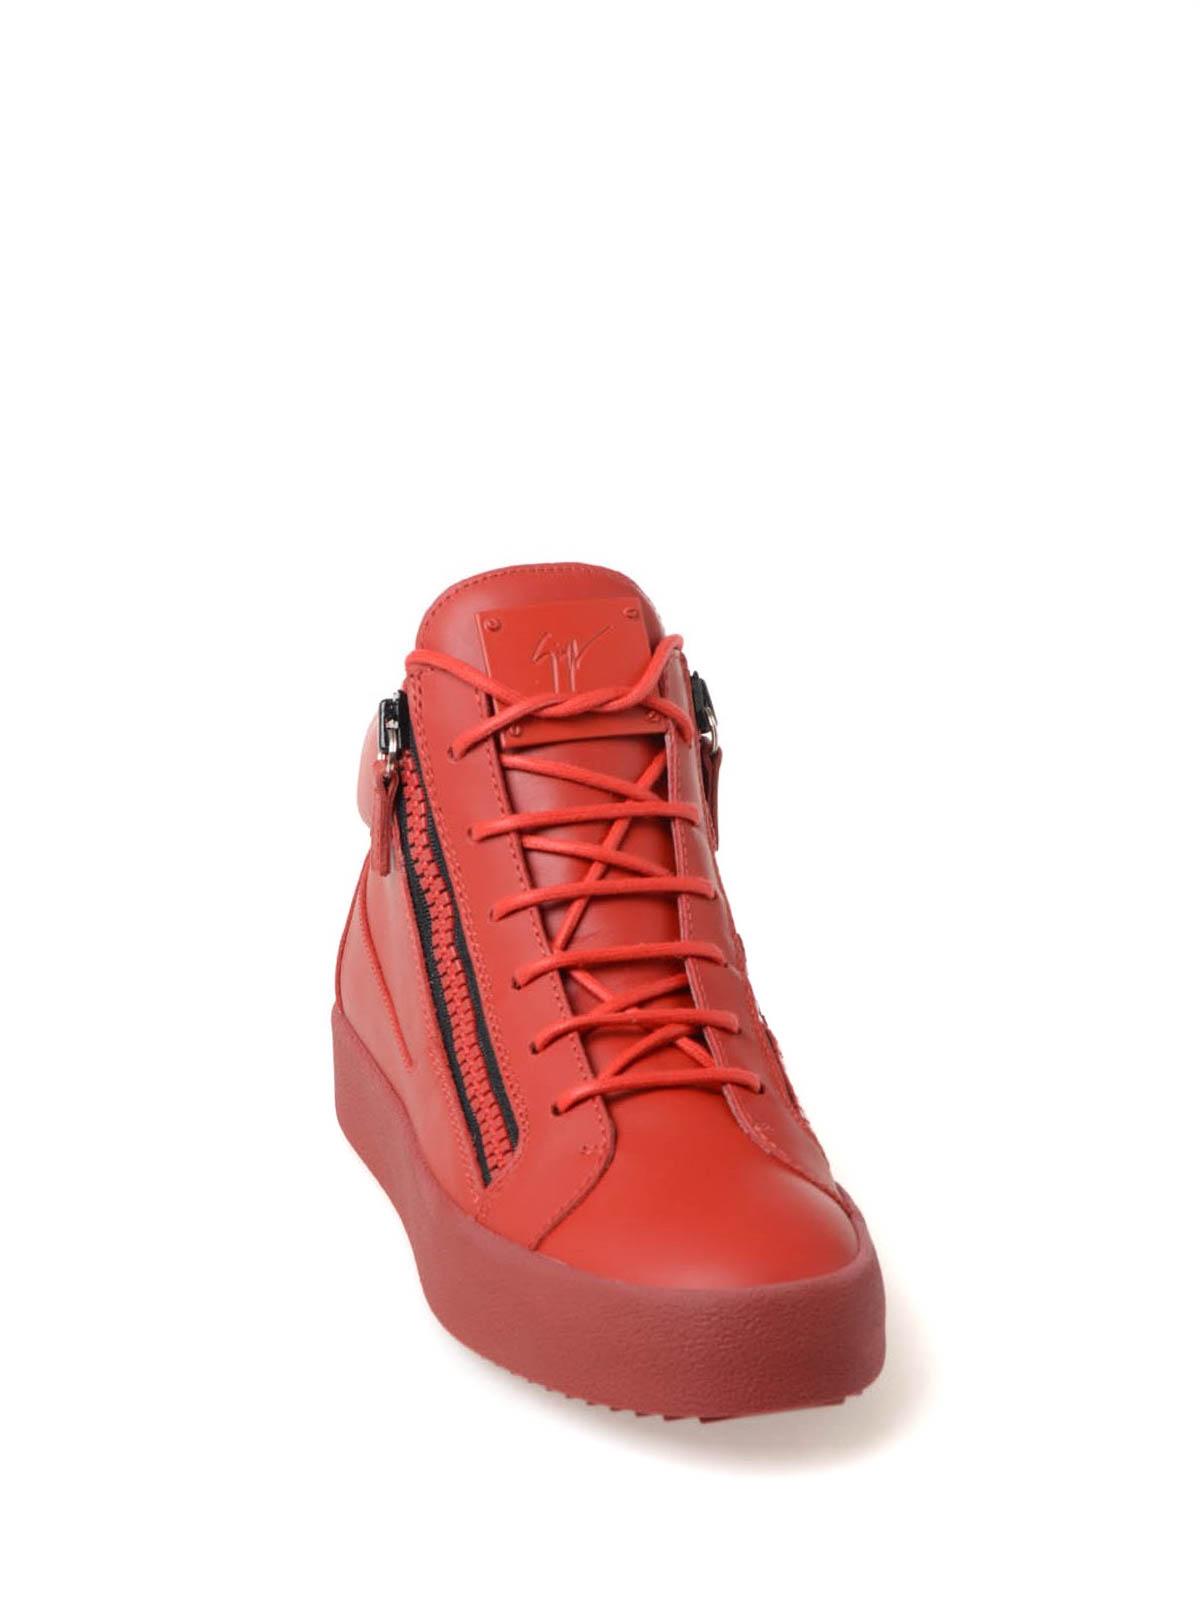 giuseppe zanotti red wedge sneakers